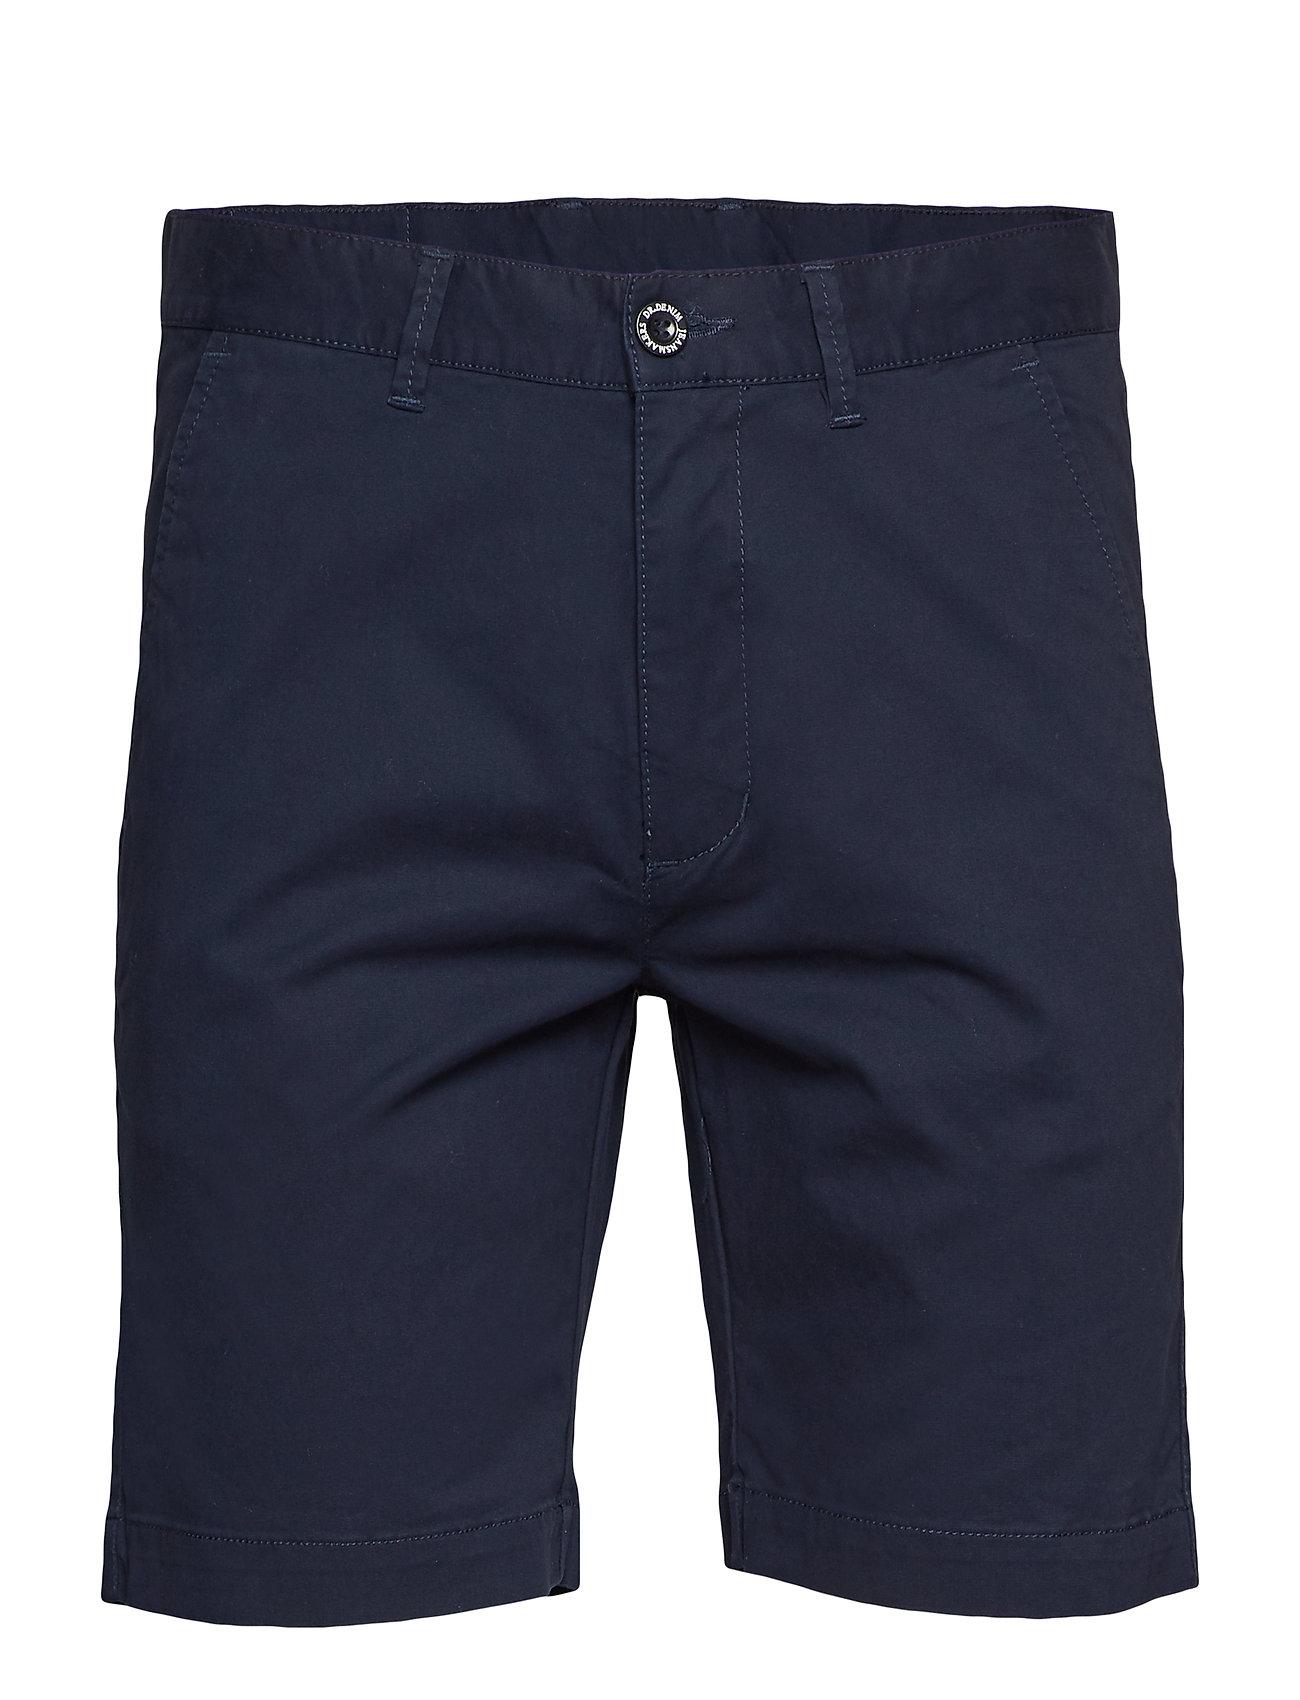 Dr. Denim Wood Shorts - DEEP BLUE